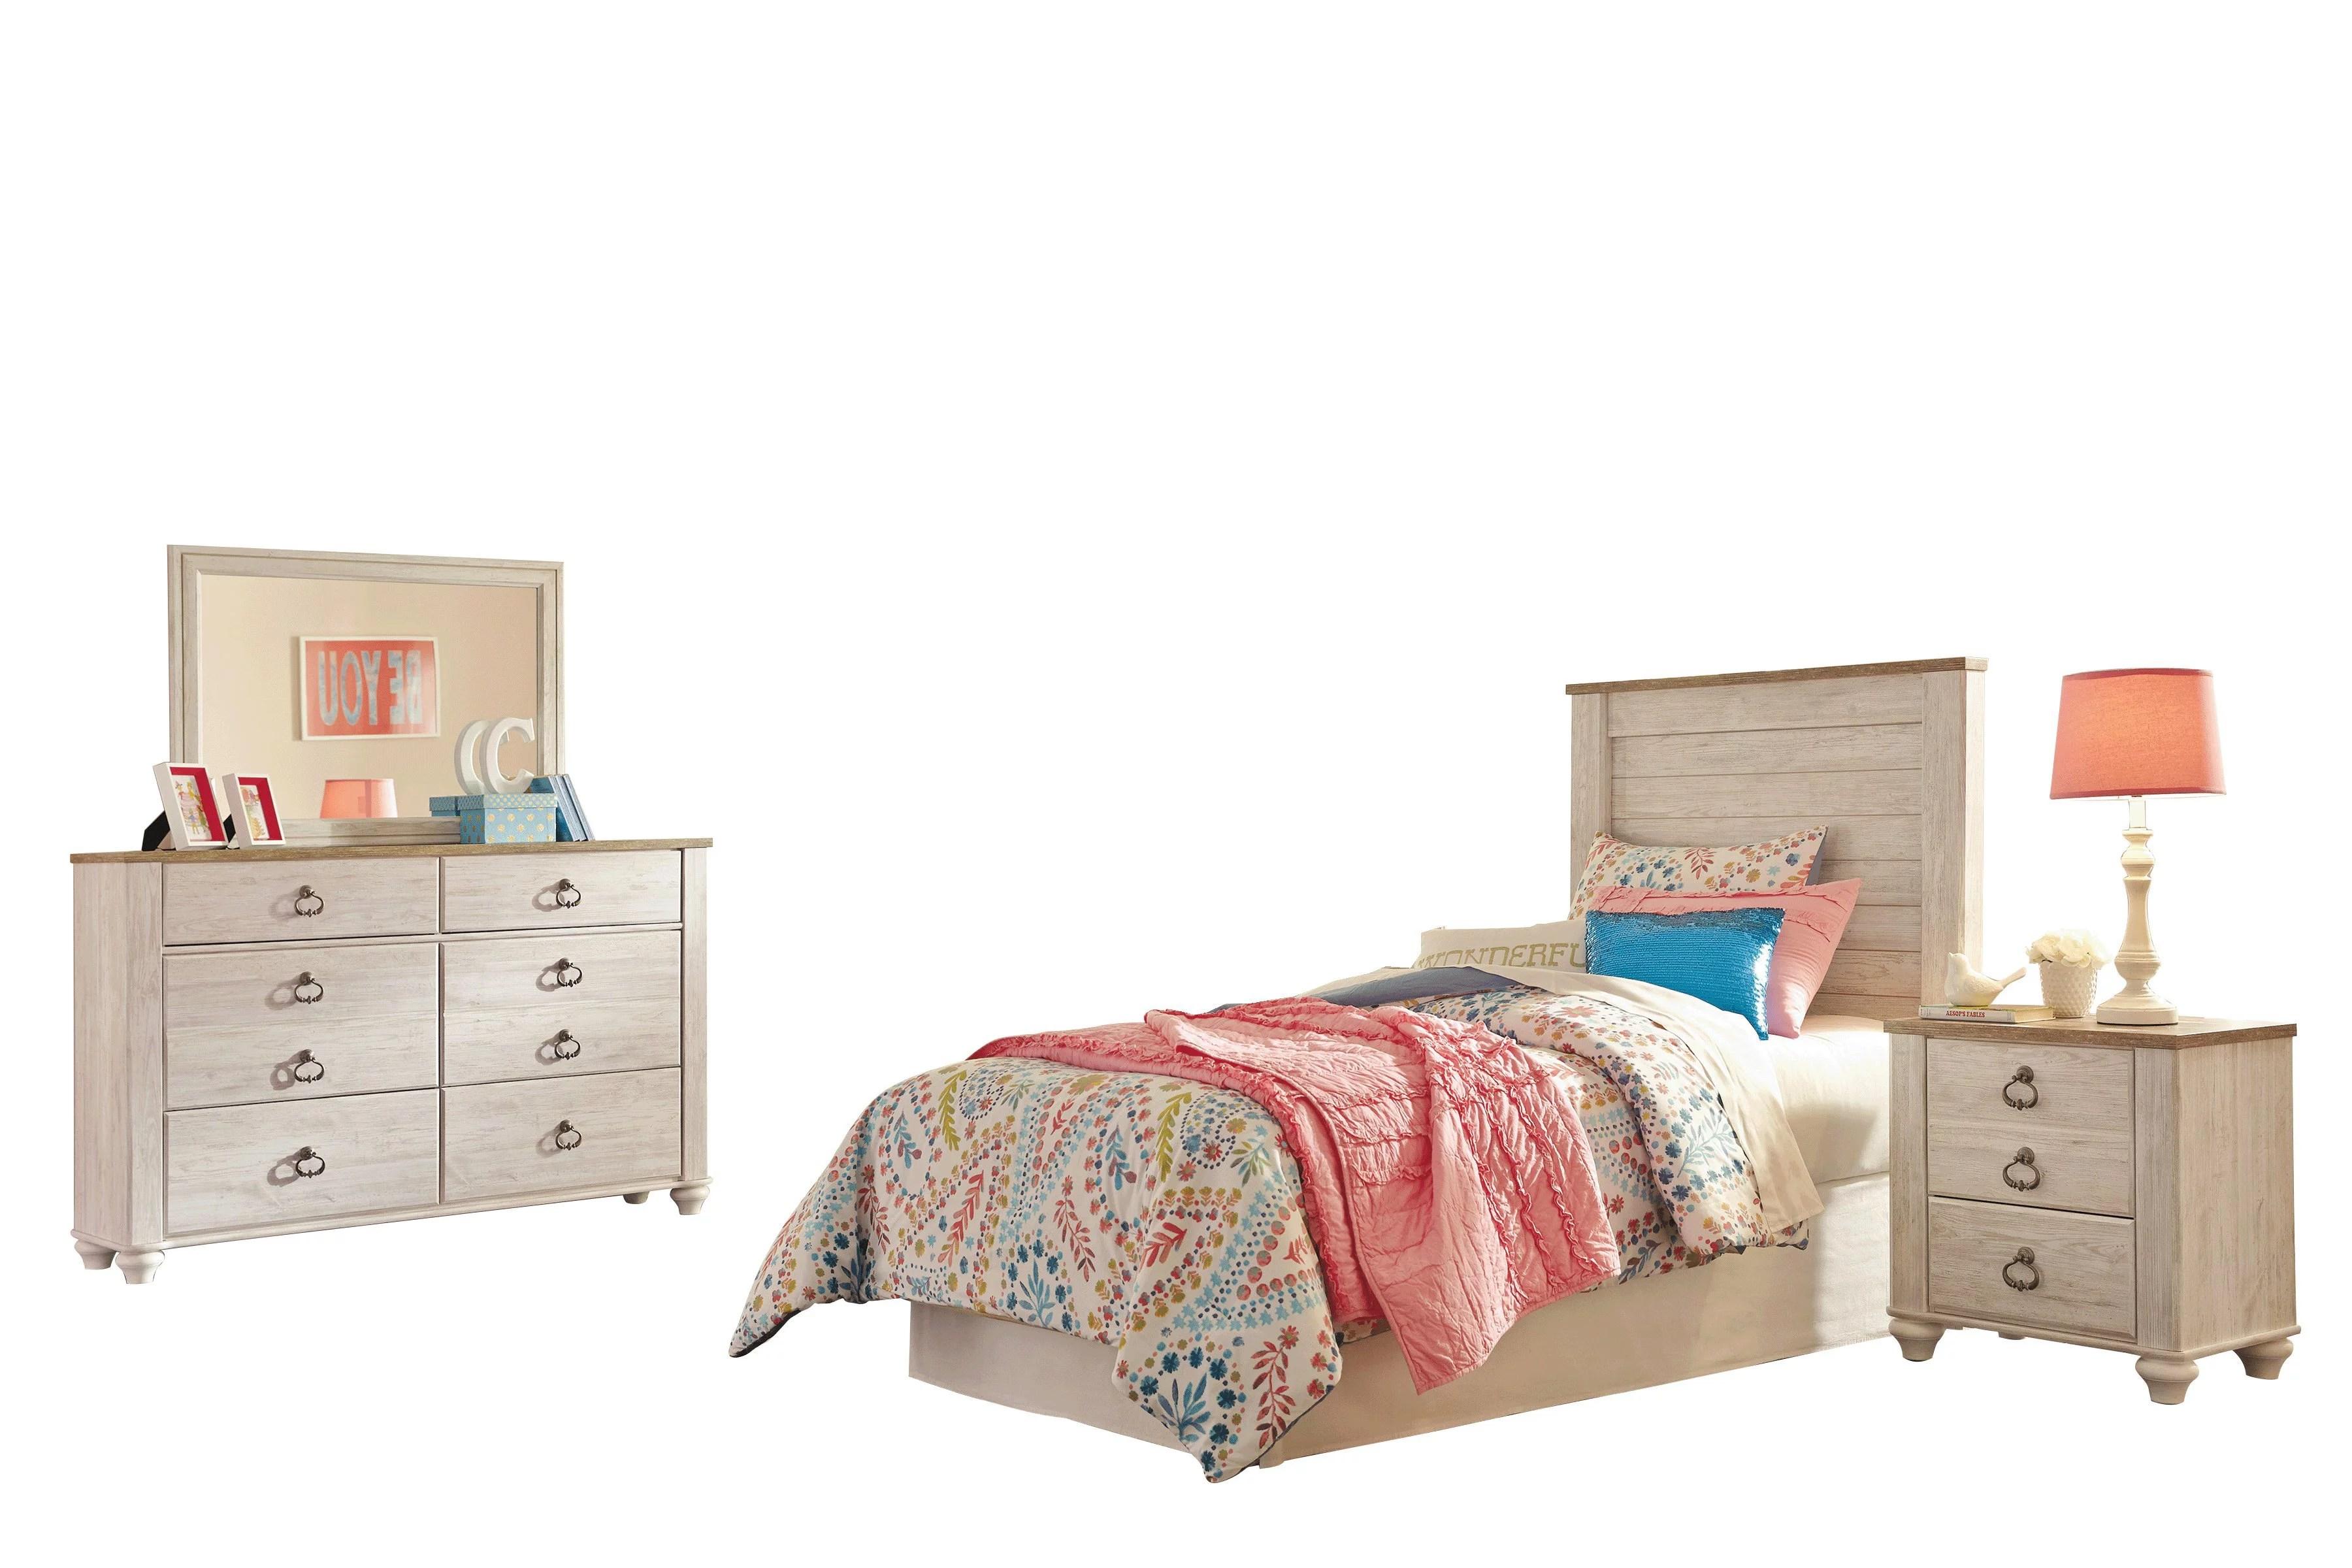 Ashley Furniture Willowton 4 Pc Full Panel Bedroom Set White Walmart Com Walmart Com